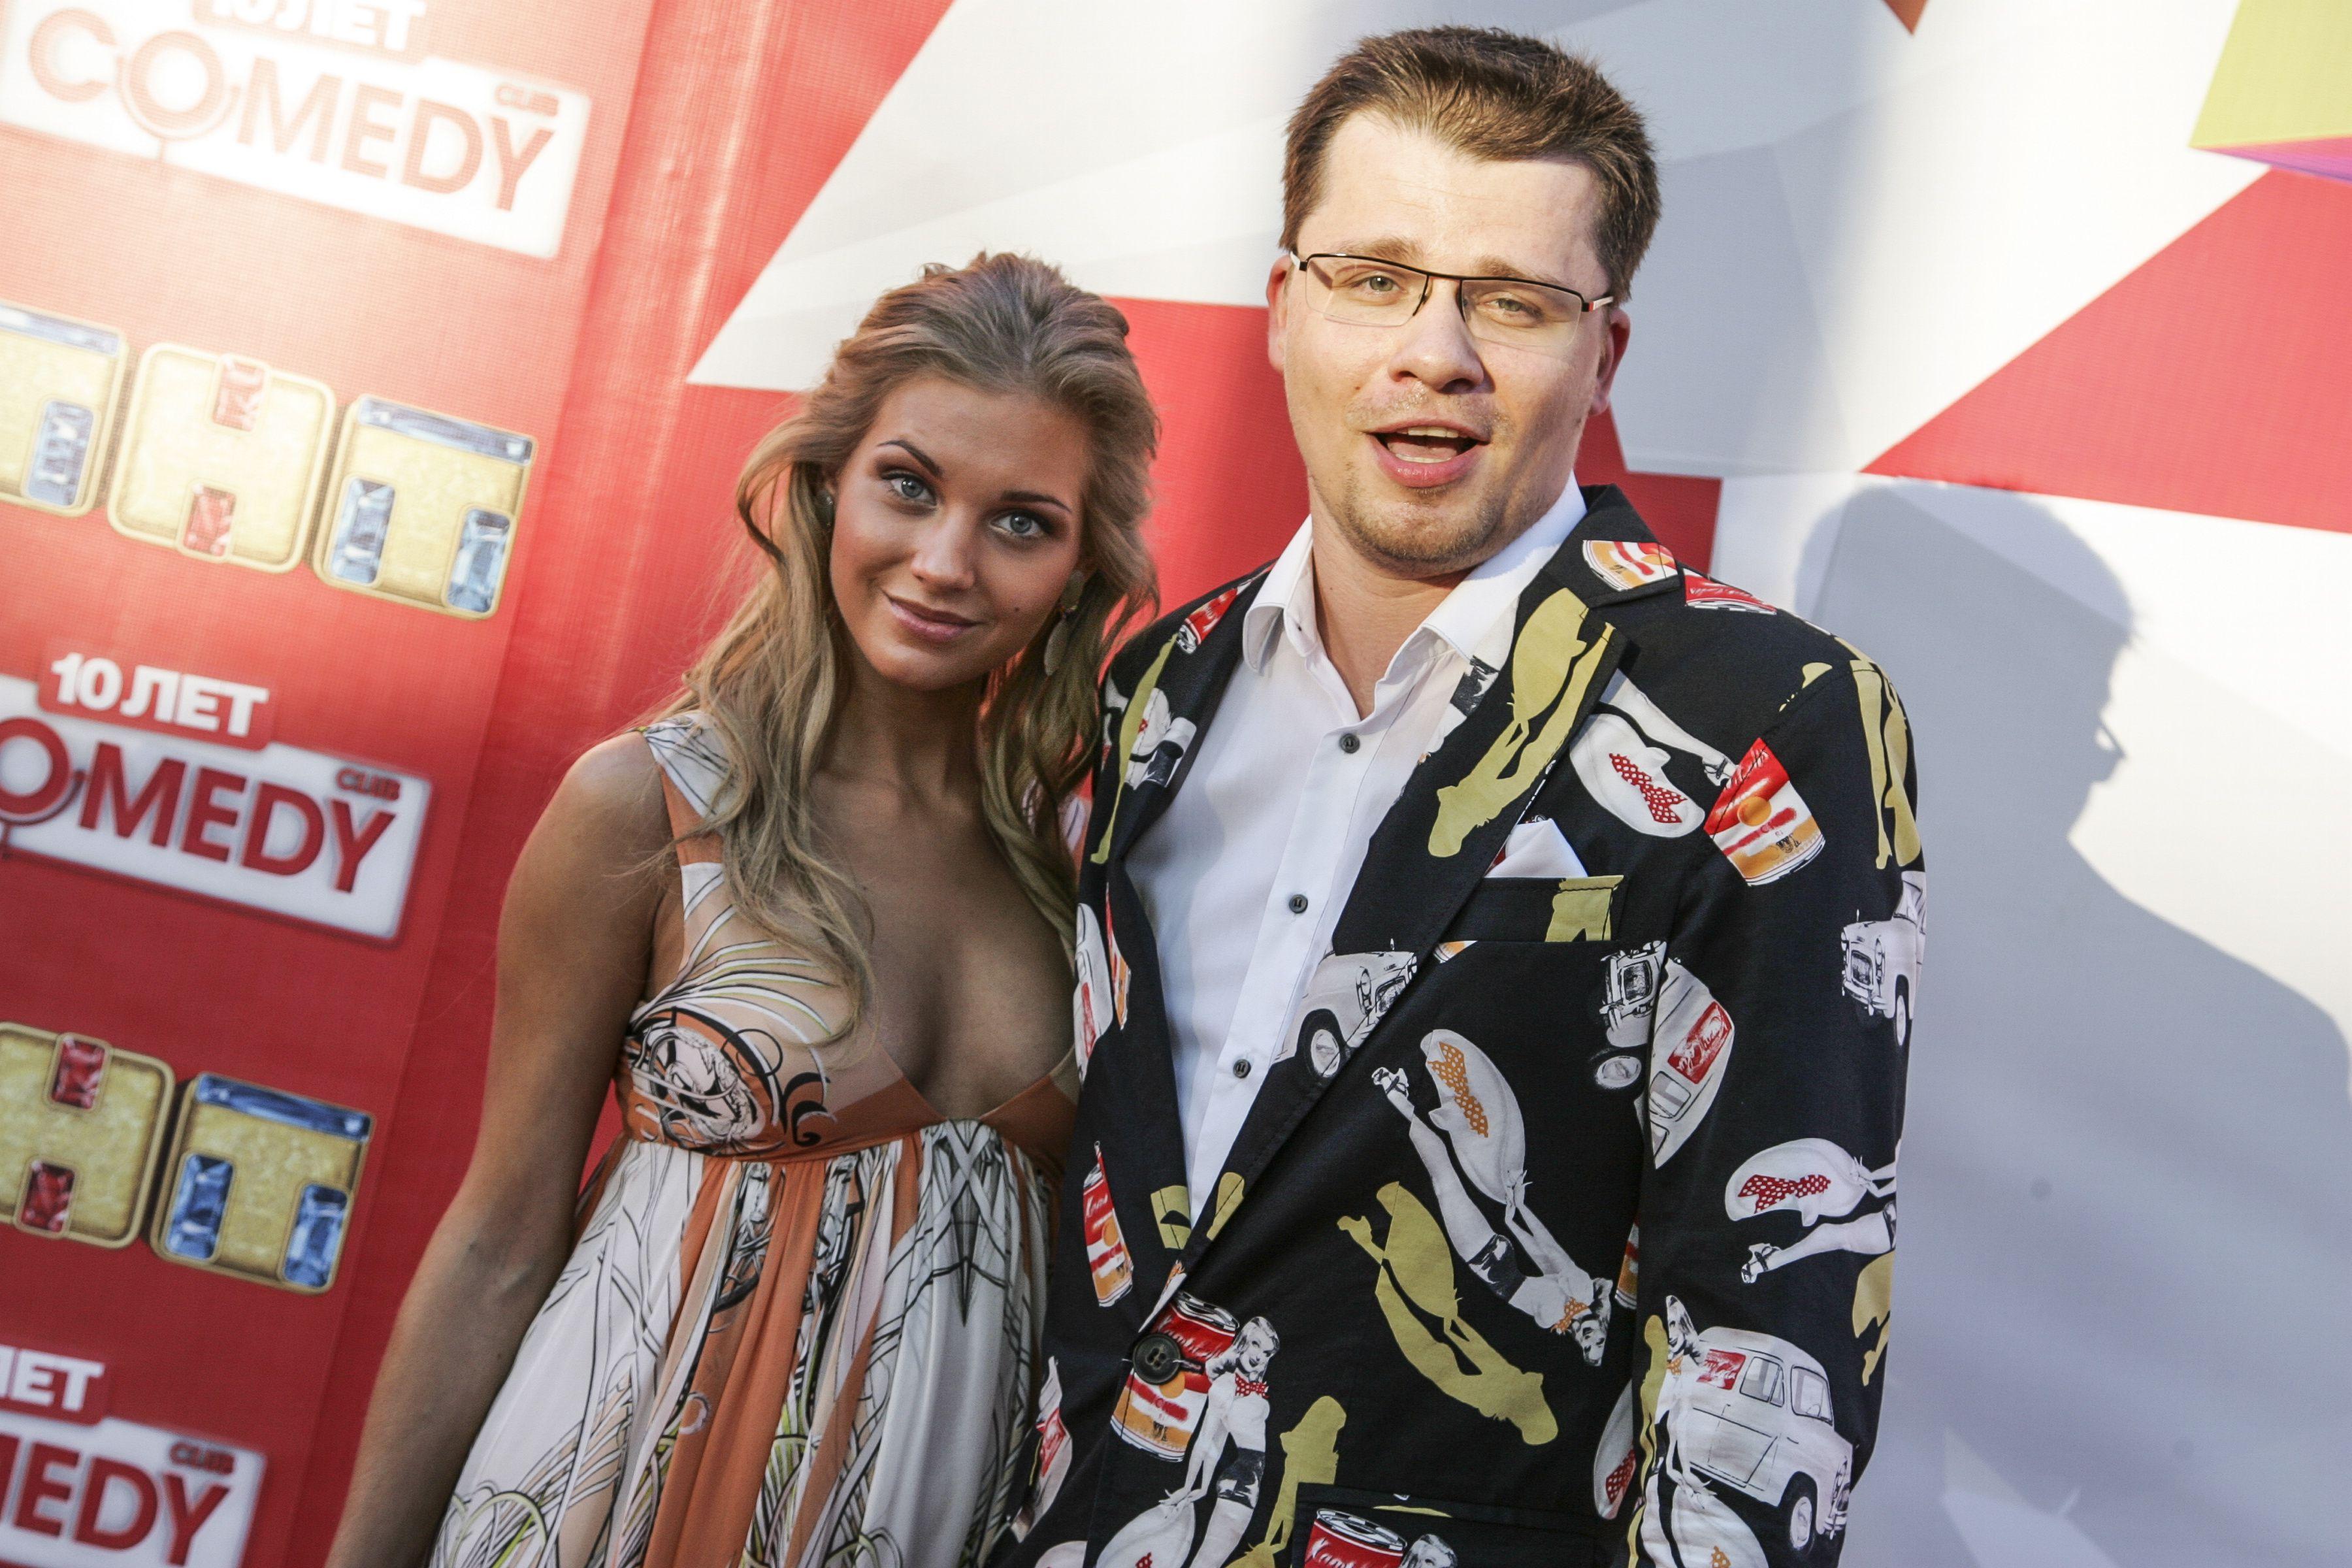 Кристина Асмус и Гарик Харламов сняли поцелуй на видео